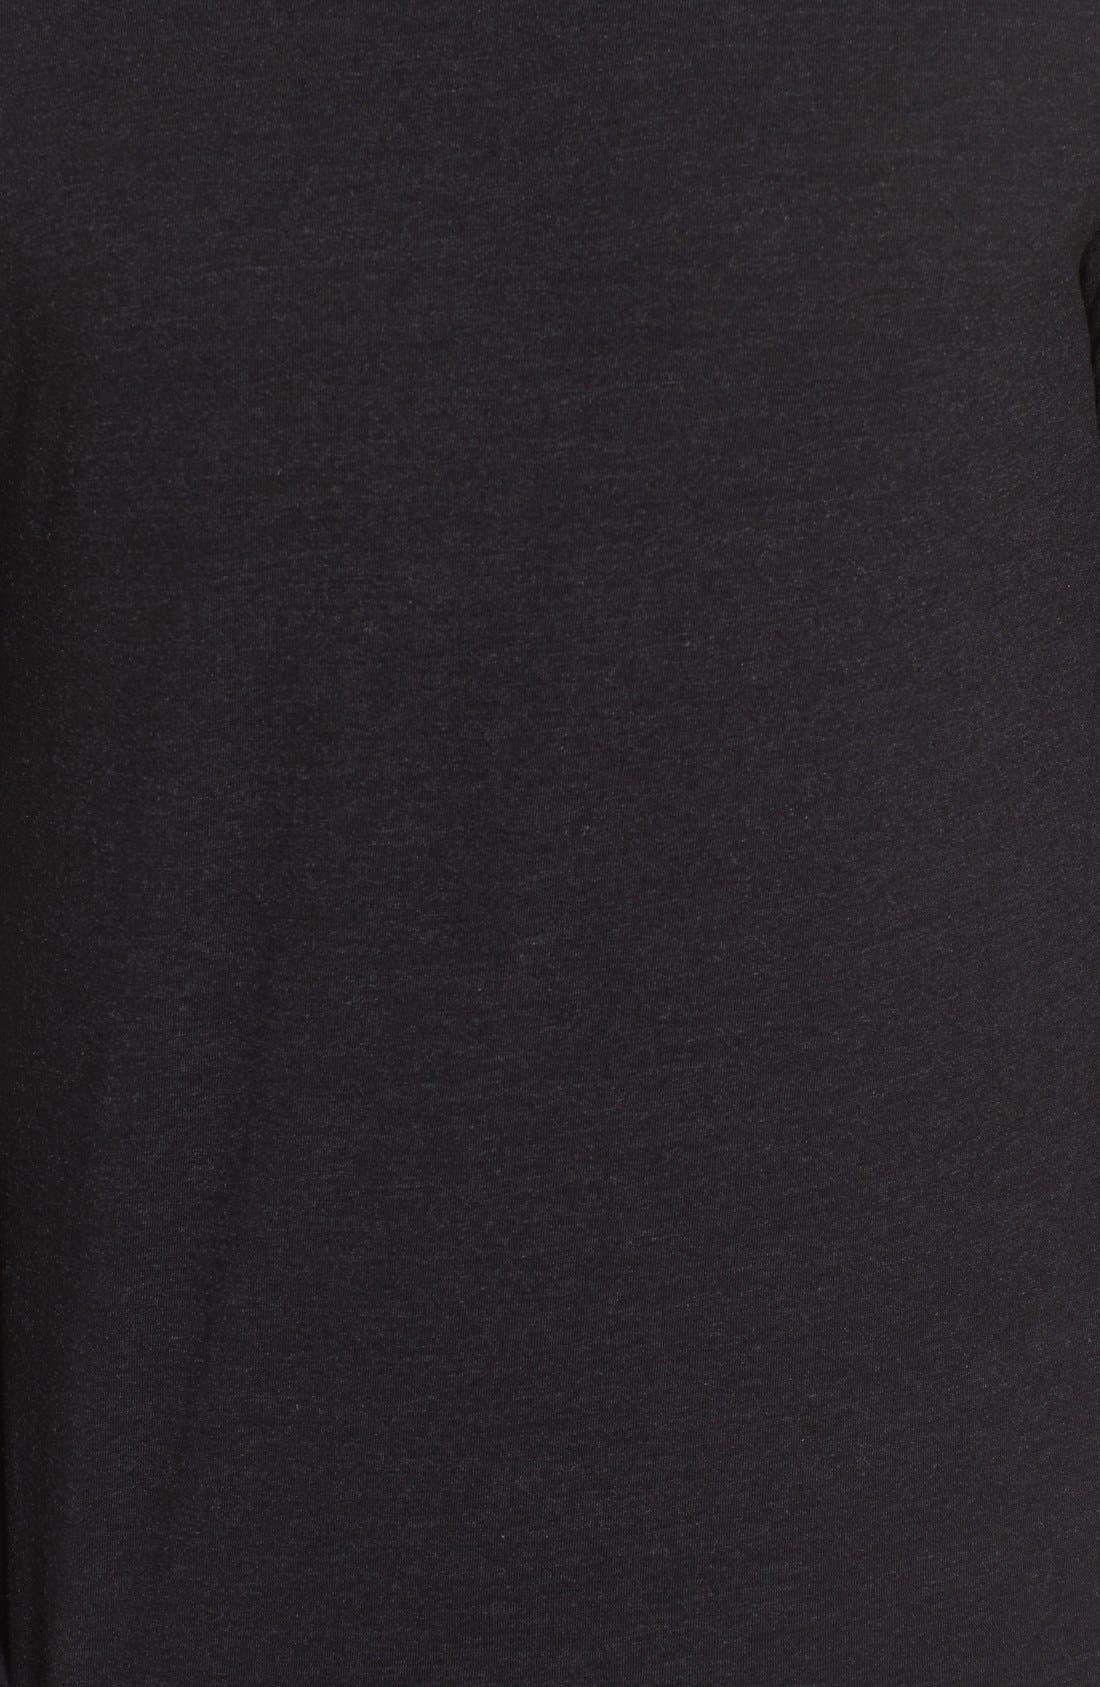 Triblend Scallop Long Sleeve Crewneck T-Shirt,                             Alternate thumbnail 3, color,                             BLACK